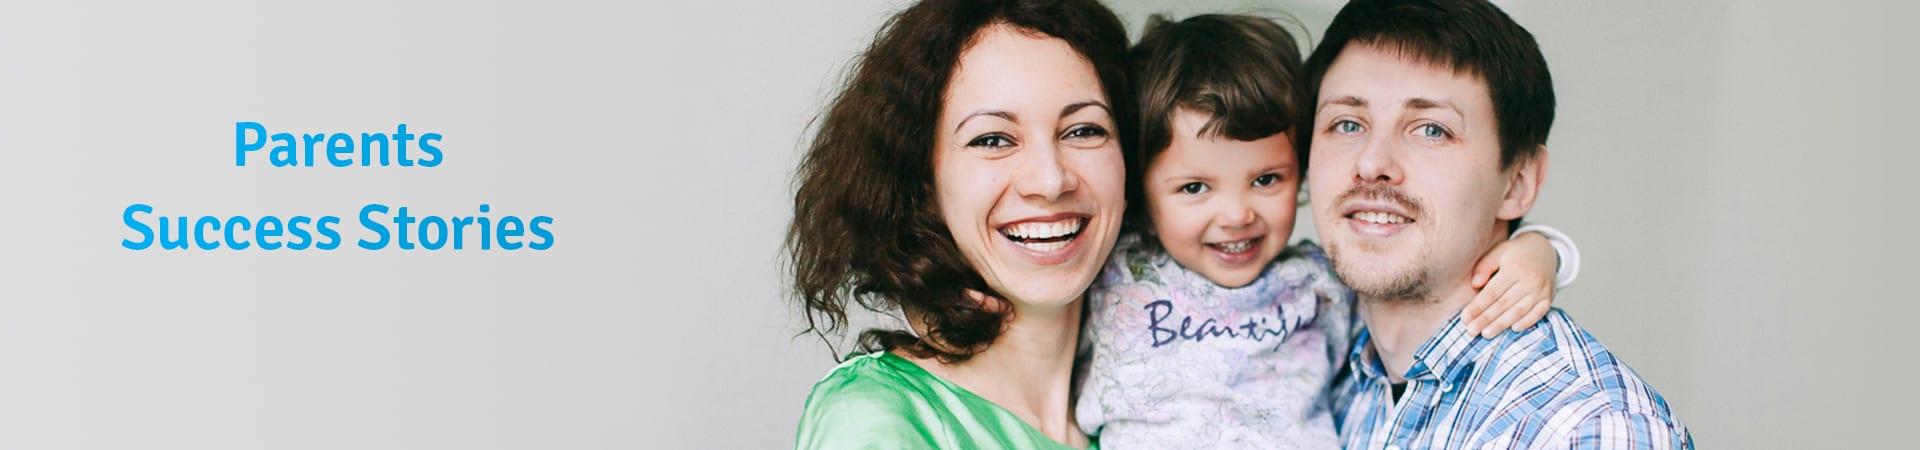 Zgodbe o uspehu - starši